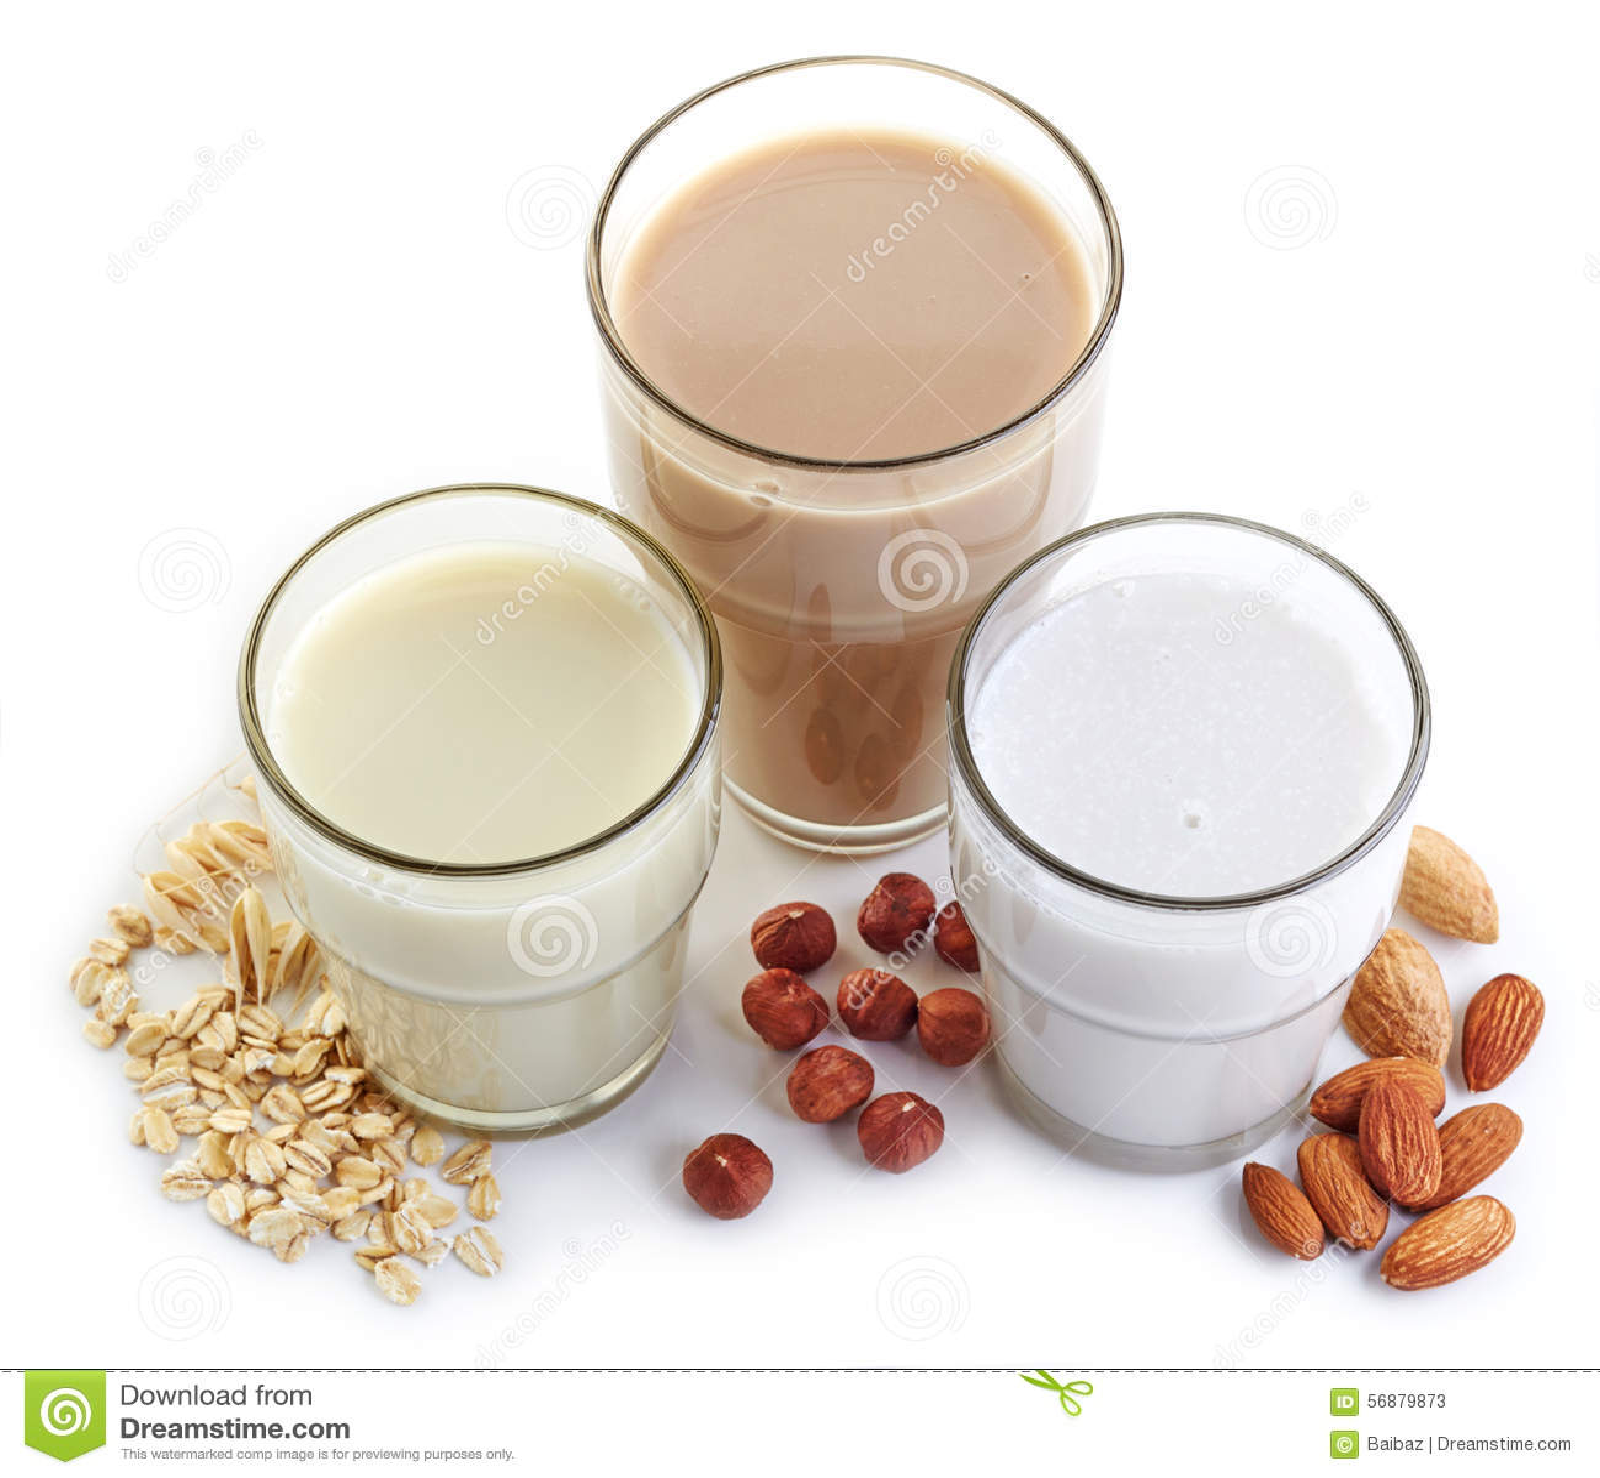 Different vegan milk: almond milk, hazelnut milk and oat milk.